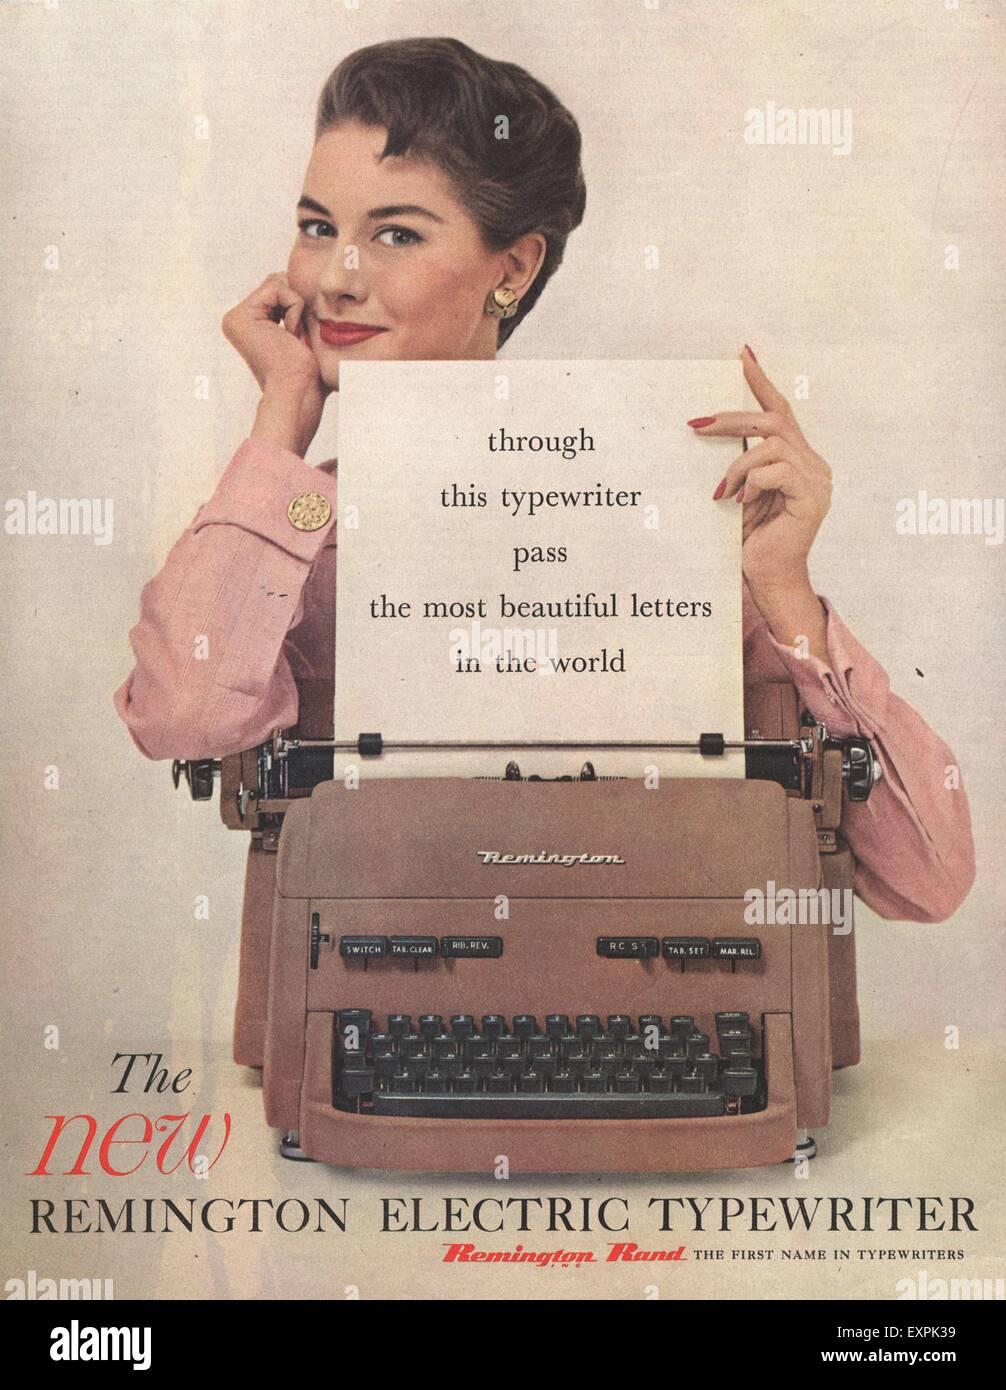 1950s USA Remington Magazine Advert Stock Photo: 85320461 - Alamy